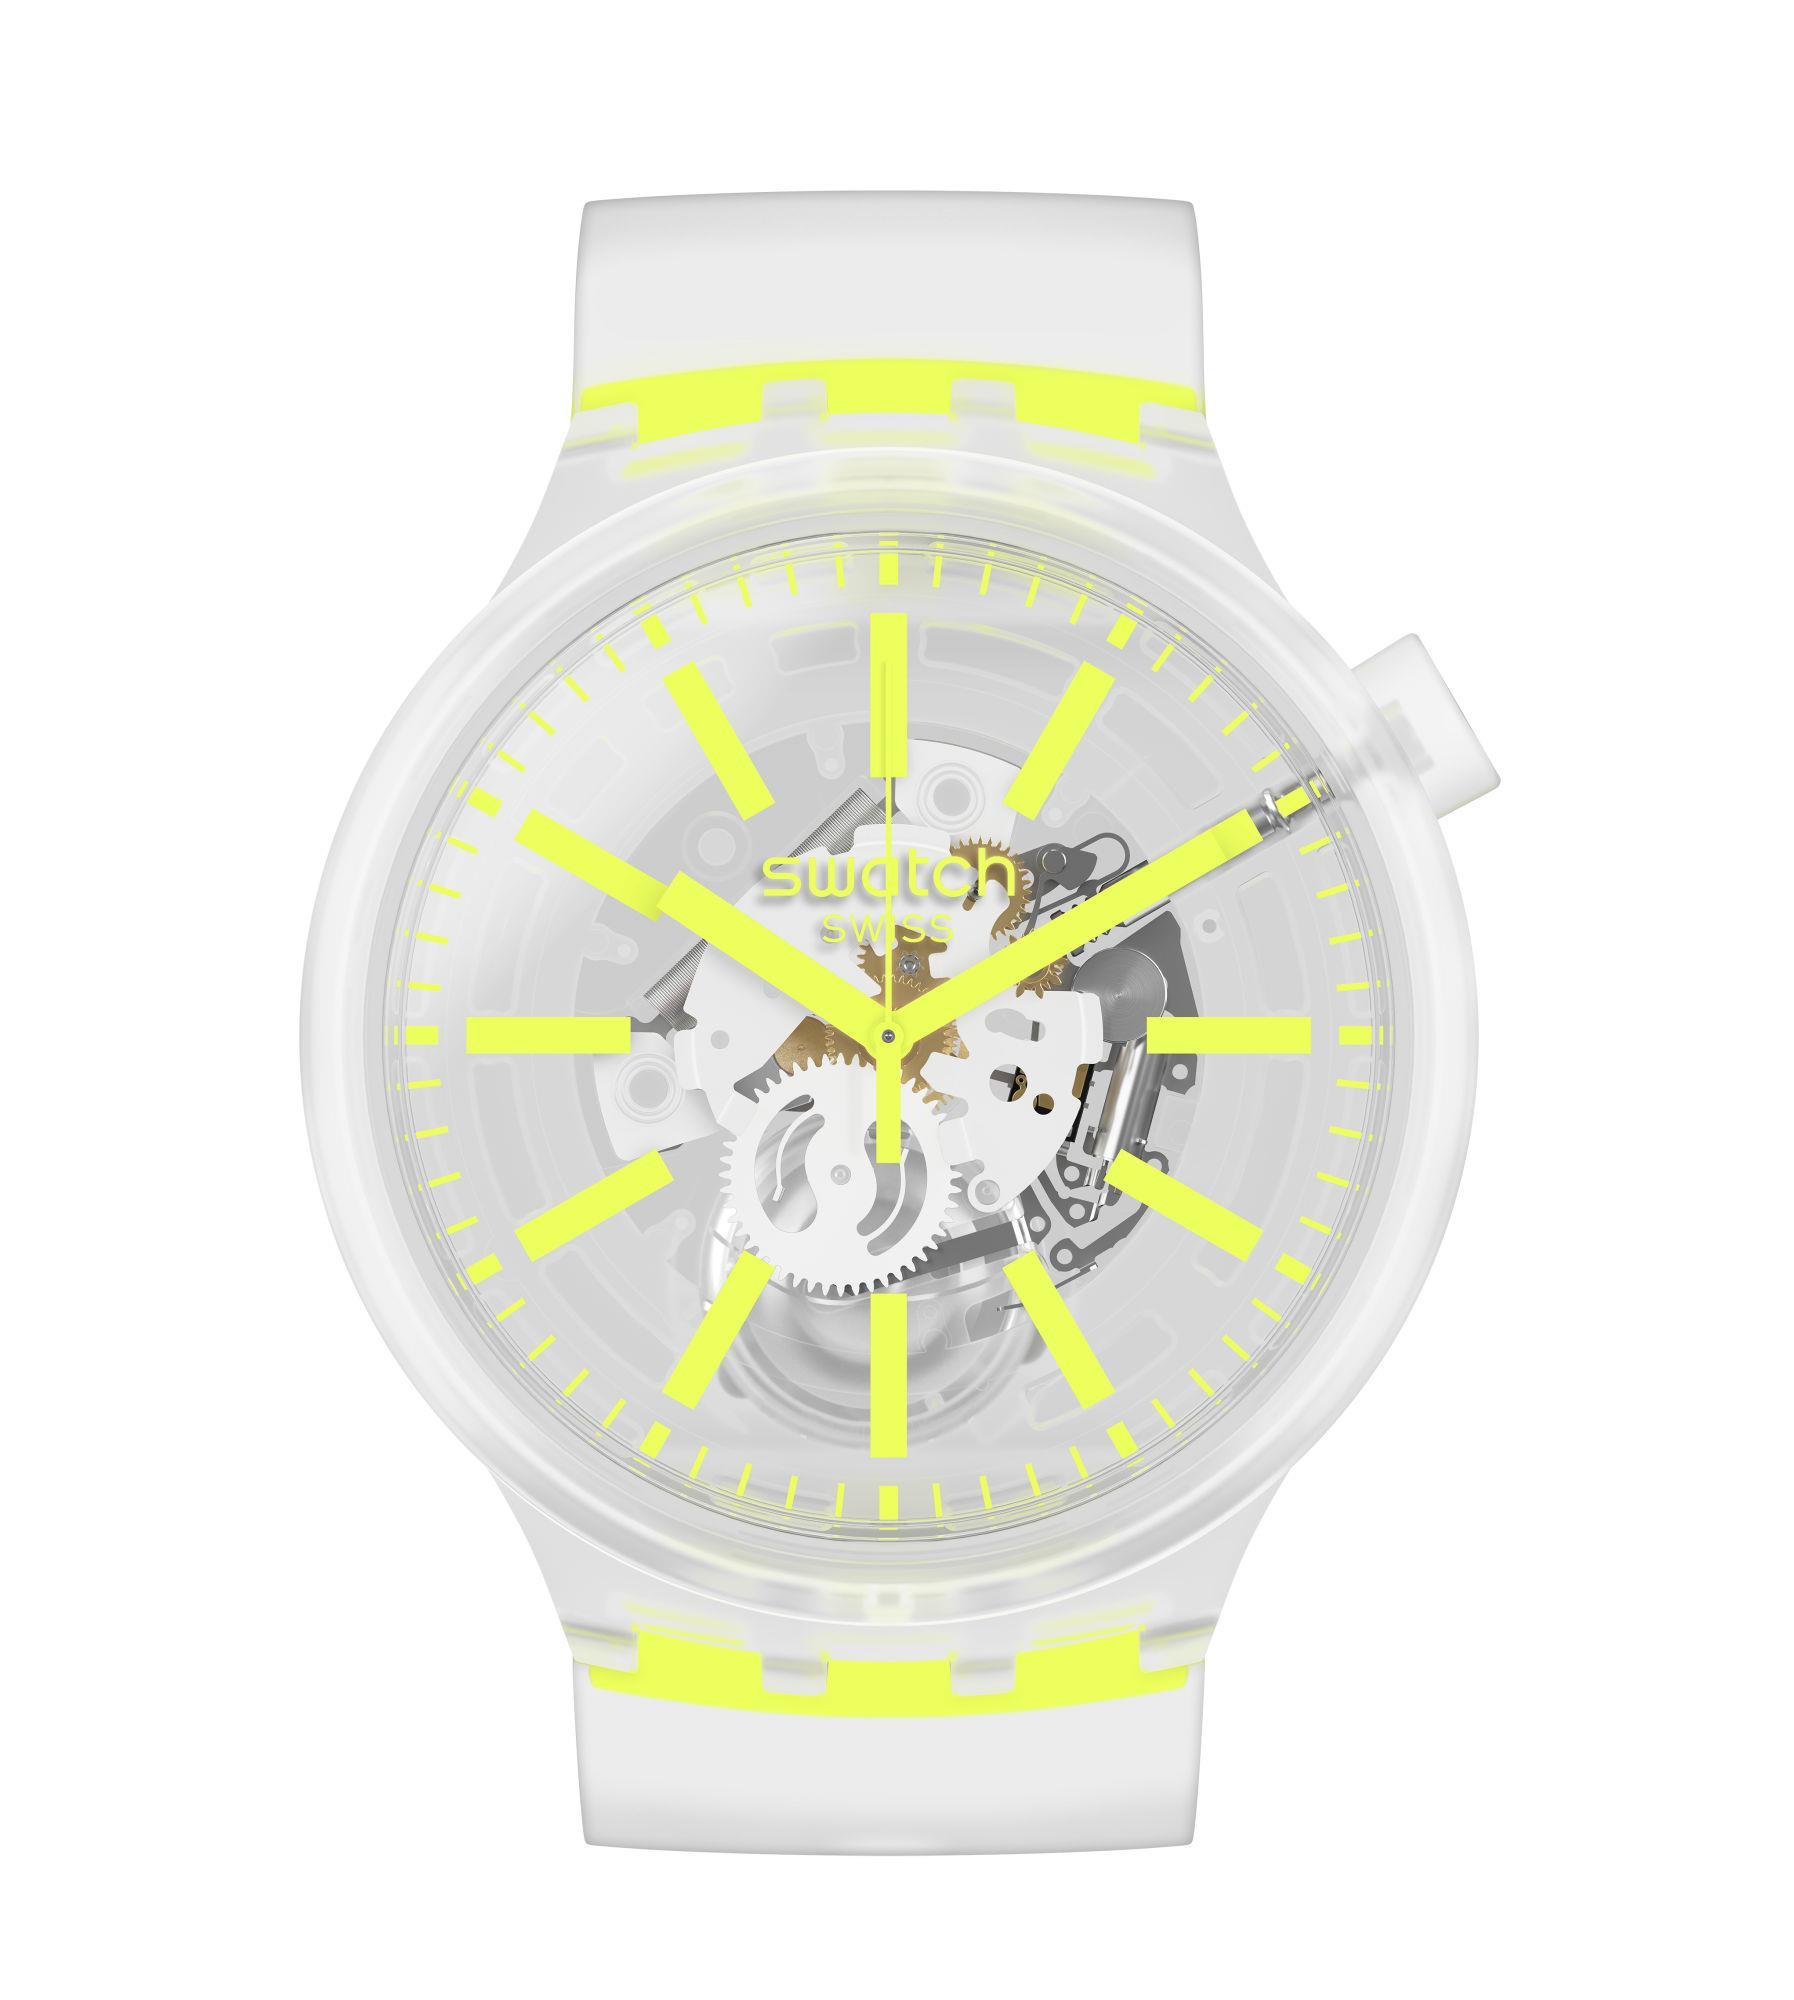 Orologio YellowinJelly - SWATCH